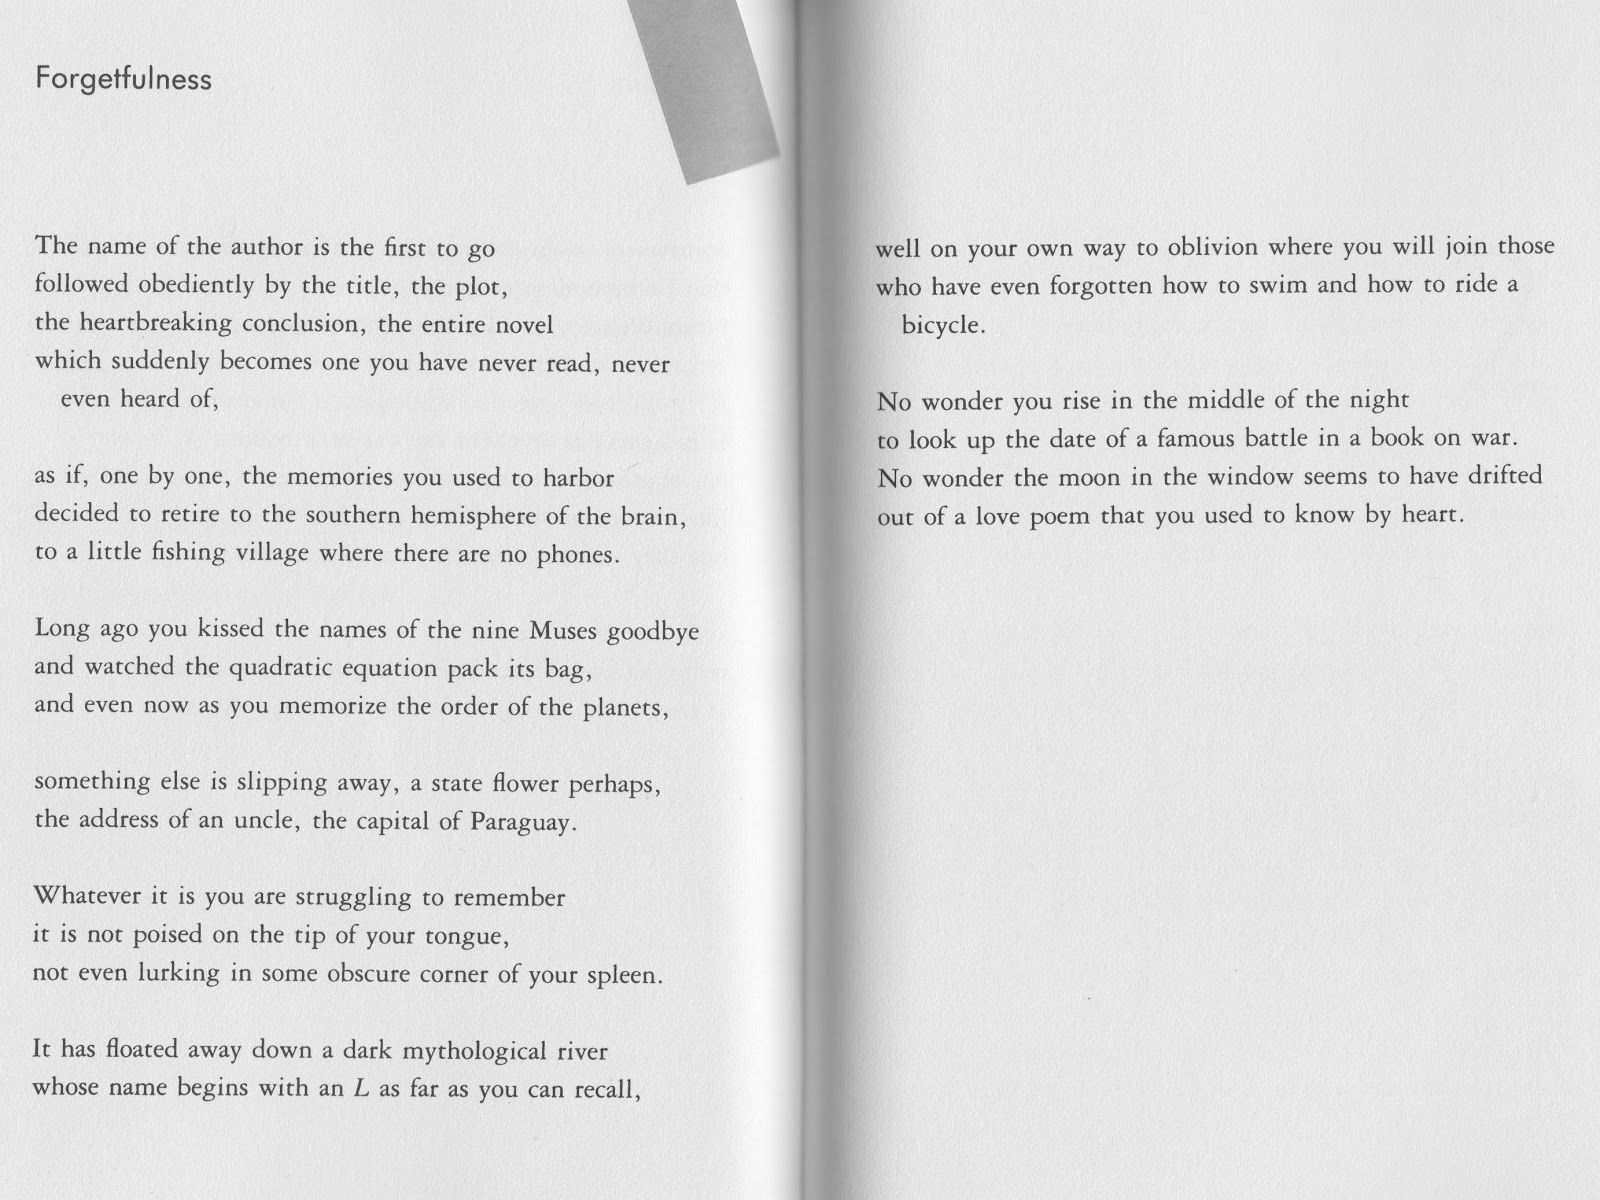 forgetfulness poem